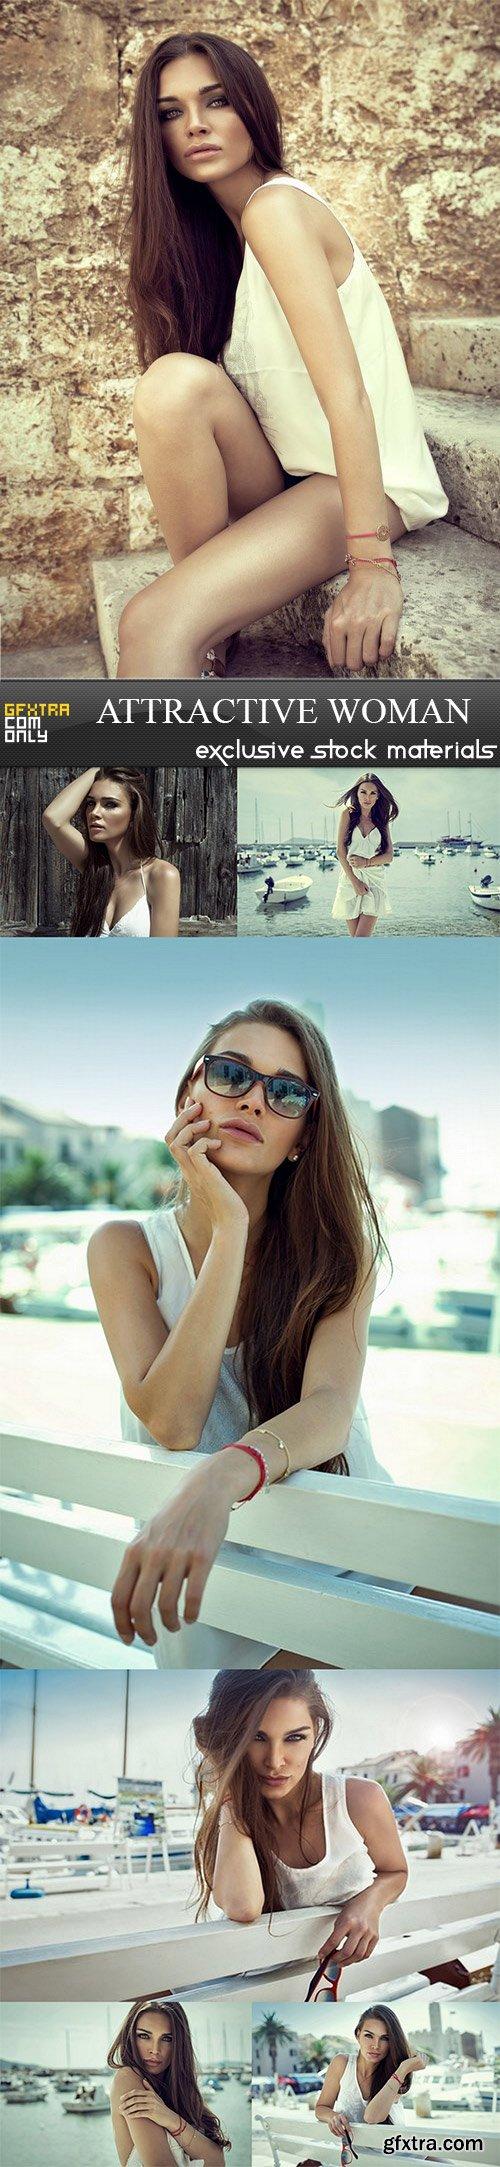 Attractive Woman - 7 UHQ JPEG